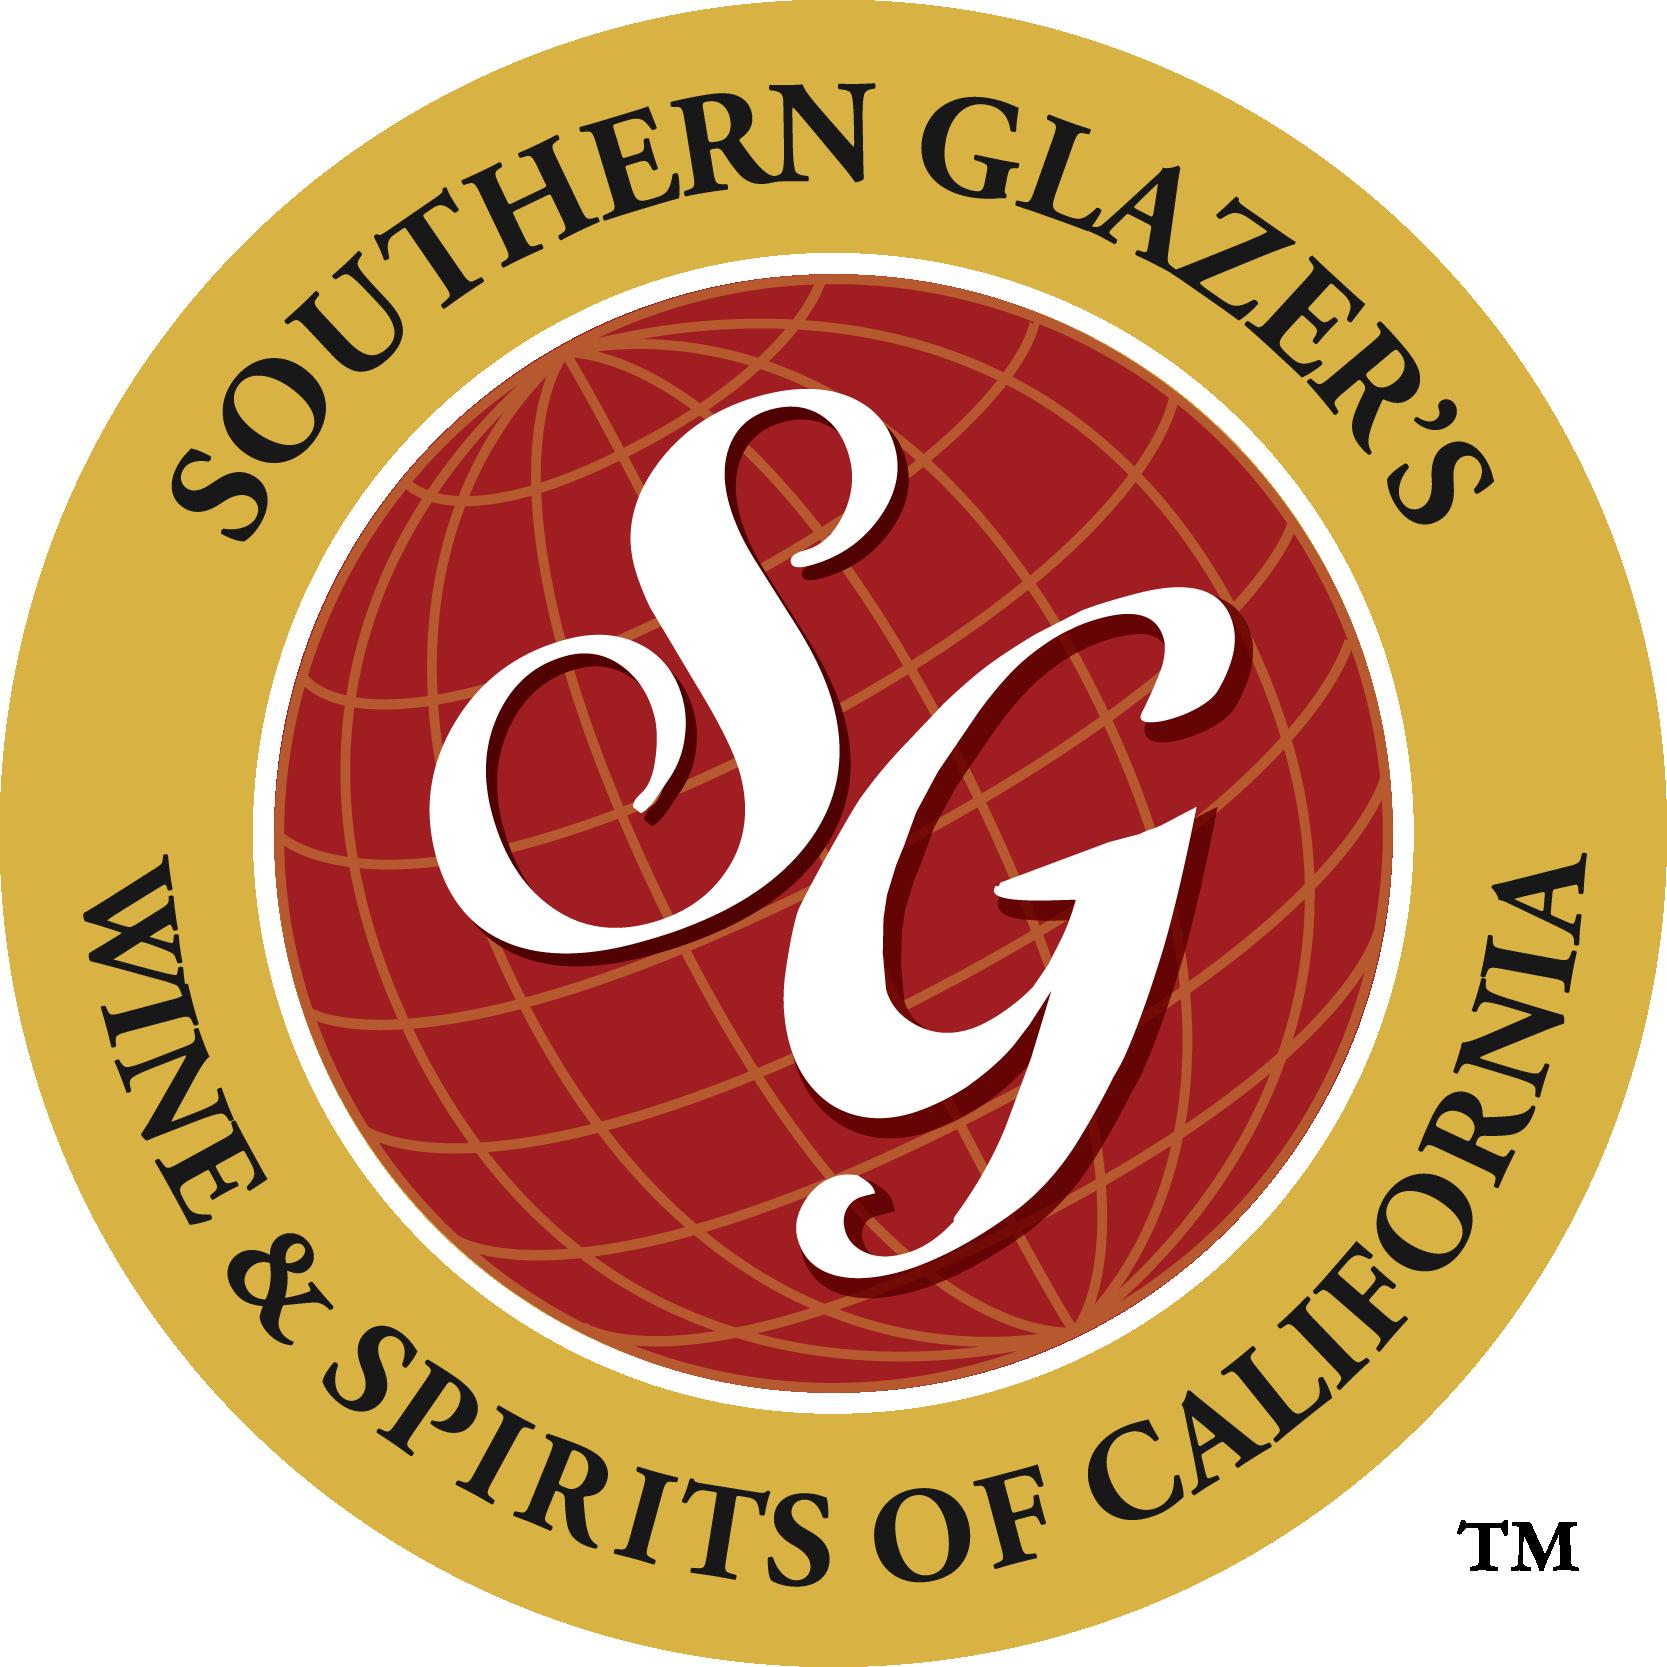 California_Southern Glazers_Seal